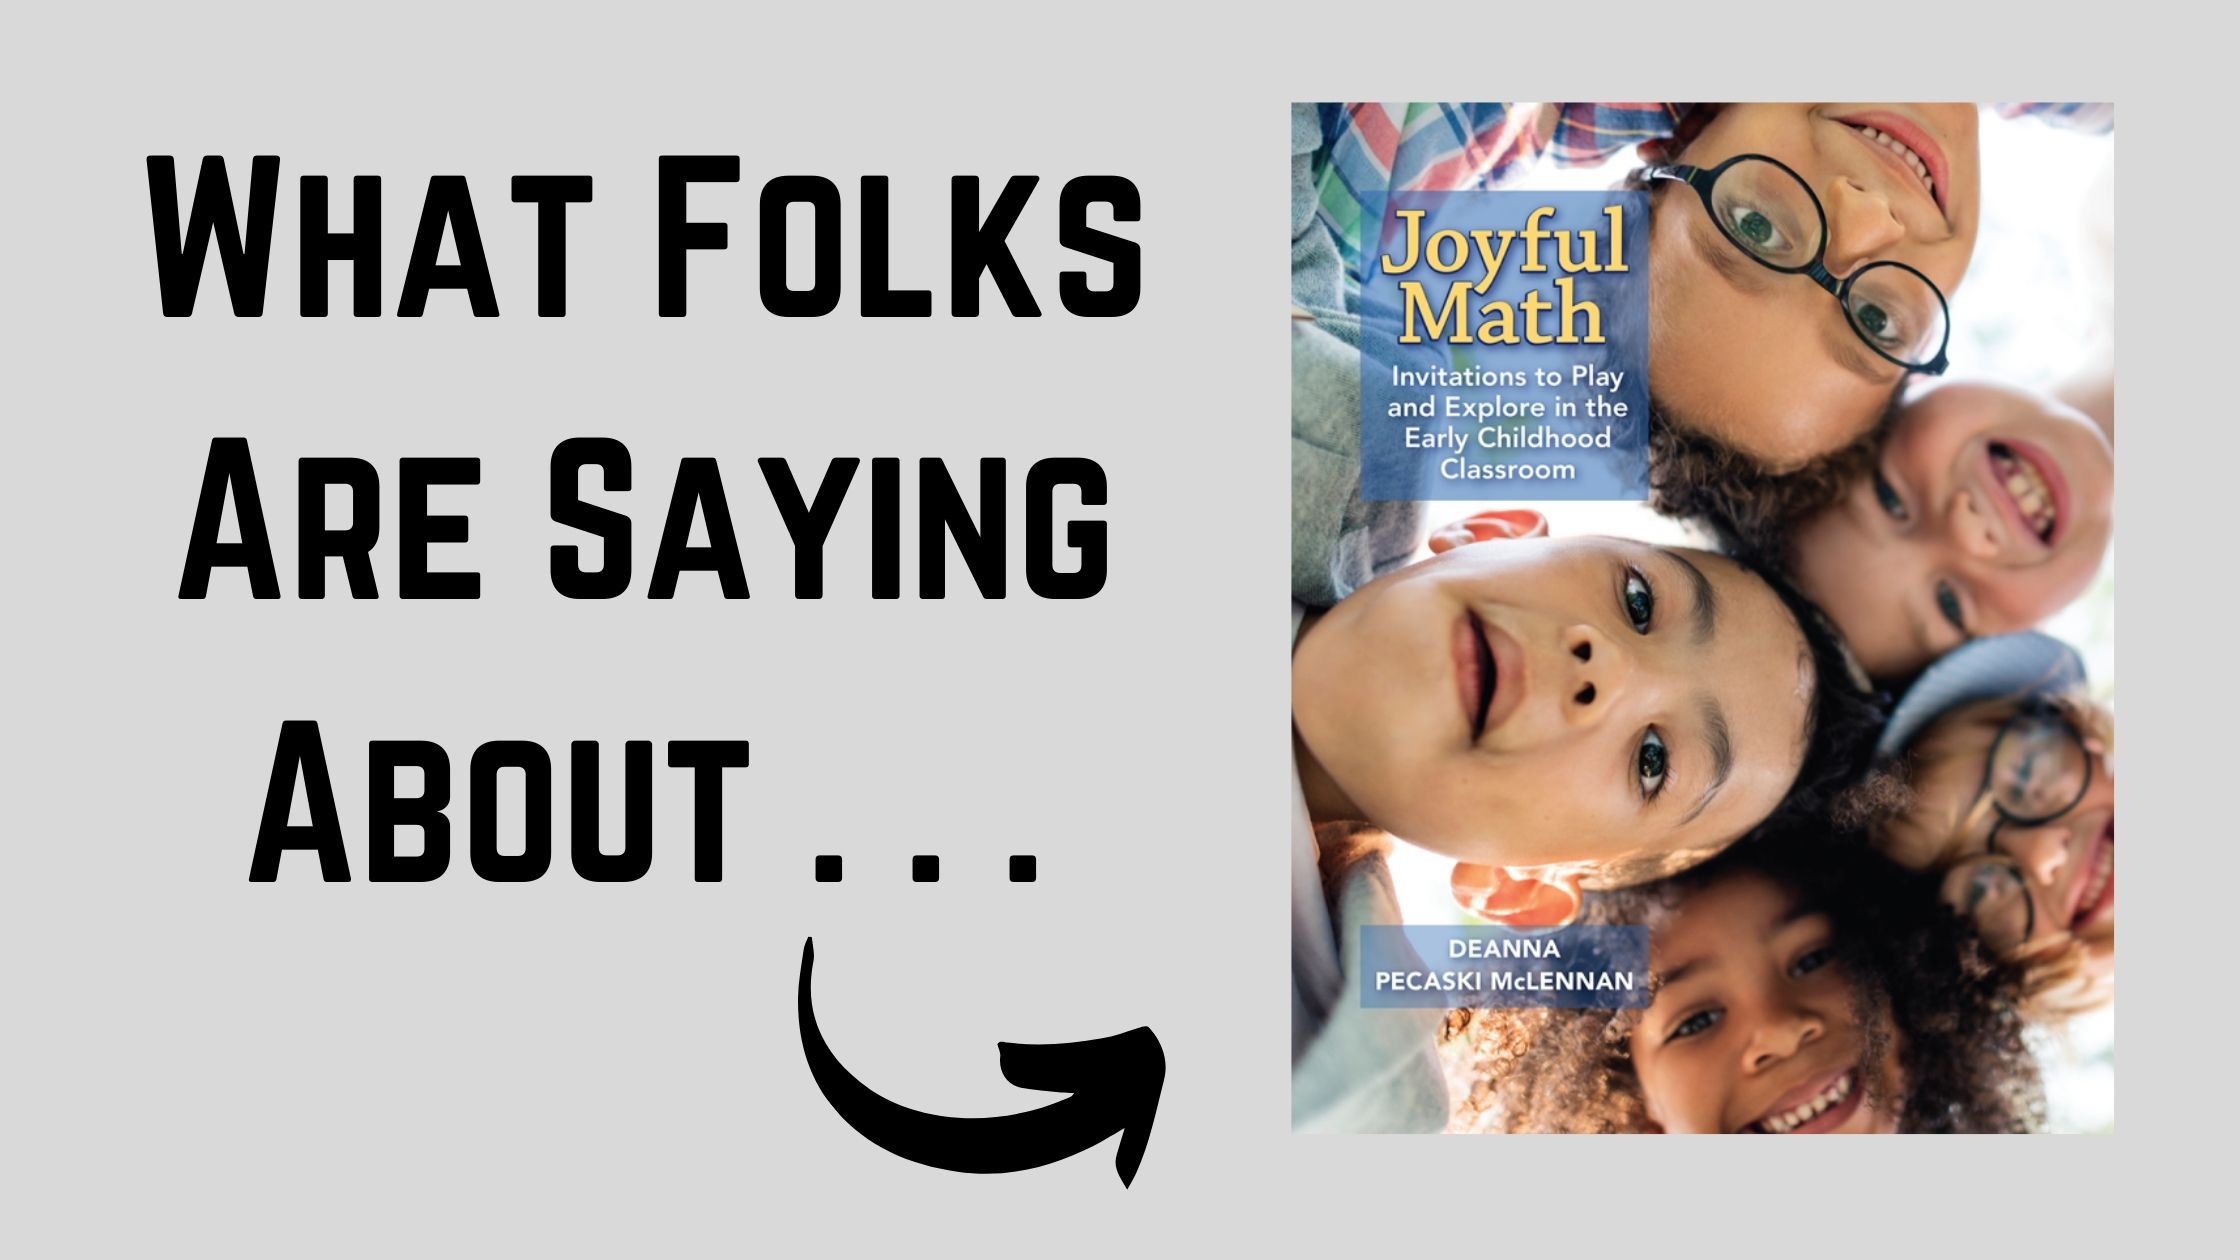 What Folks Are Saying About . . . Joyful Math